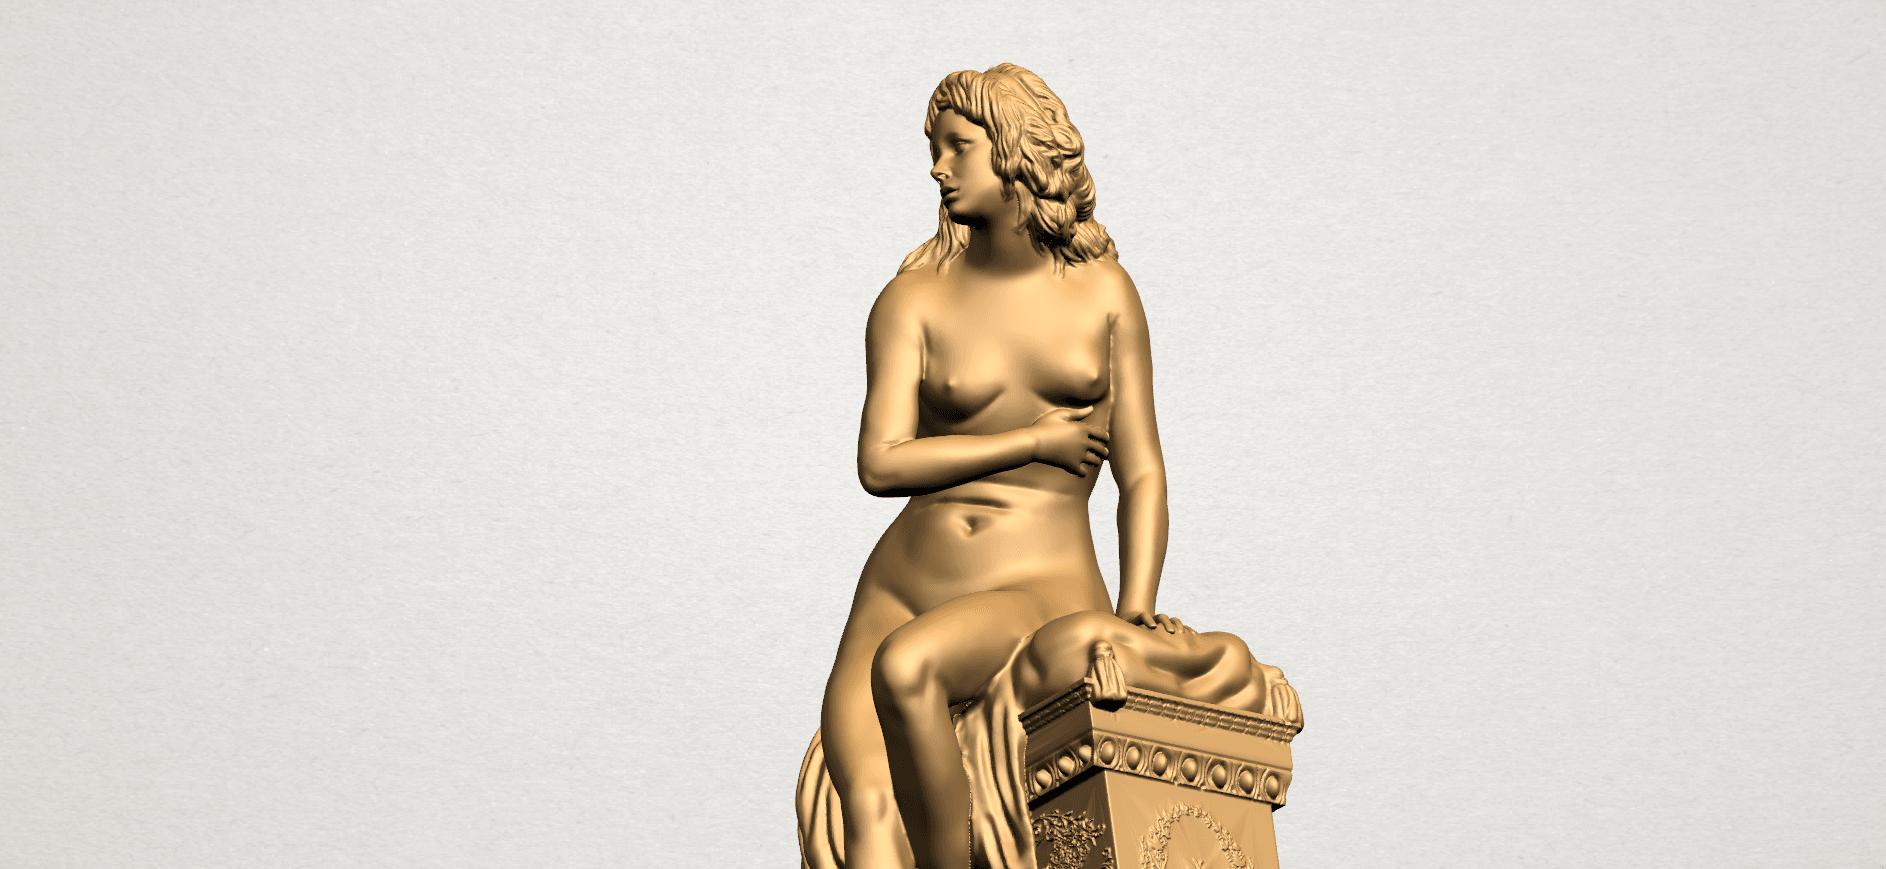 Naked Girl (i) B10.png Download free STL file Naked Girl 01 • 3D printing model, GeorgesNikkei